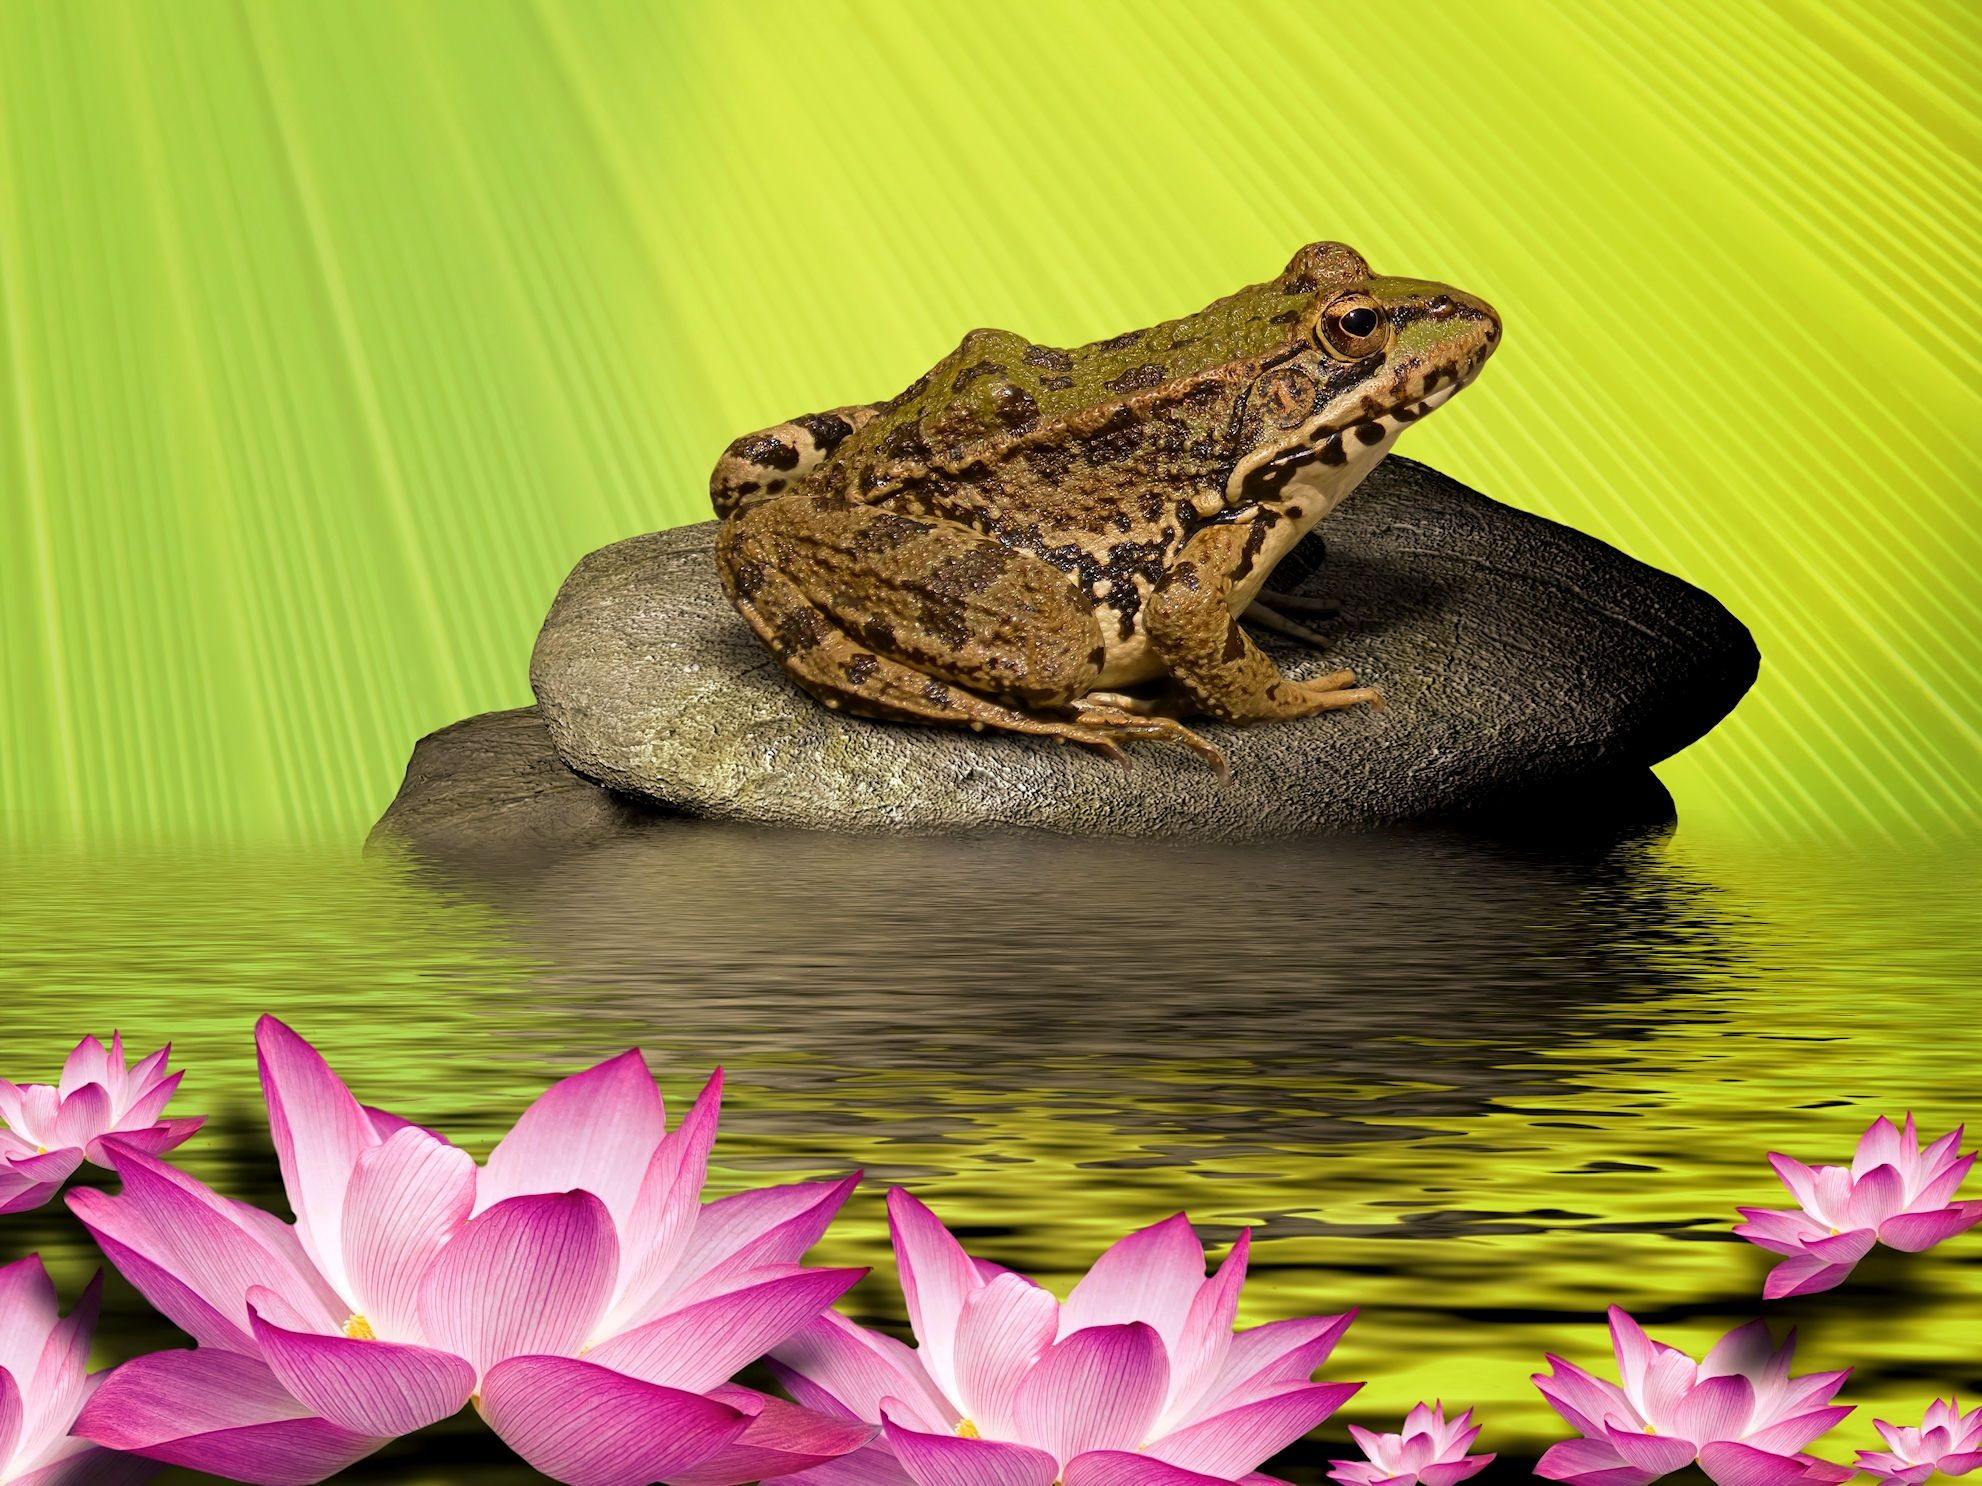 frog-1463266.jpg (1982×1486)